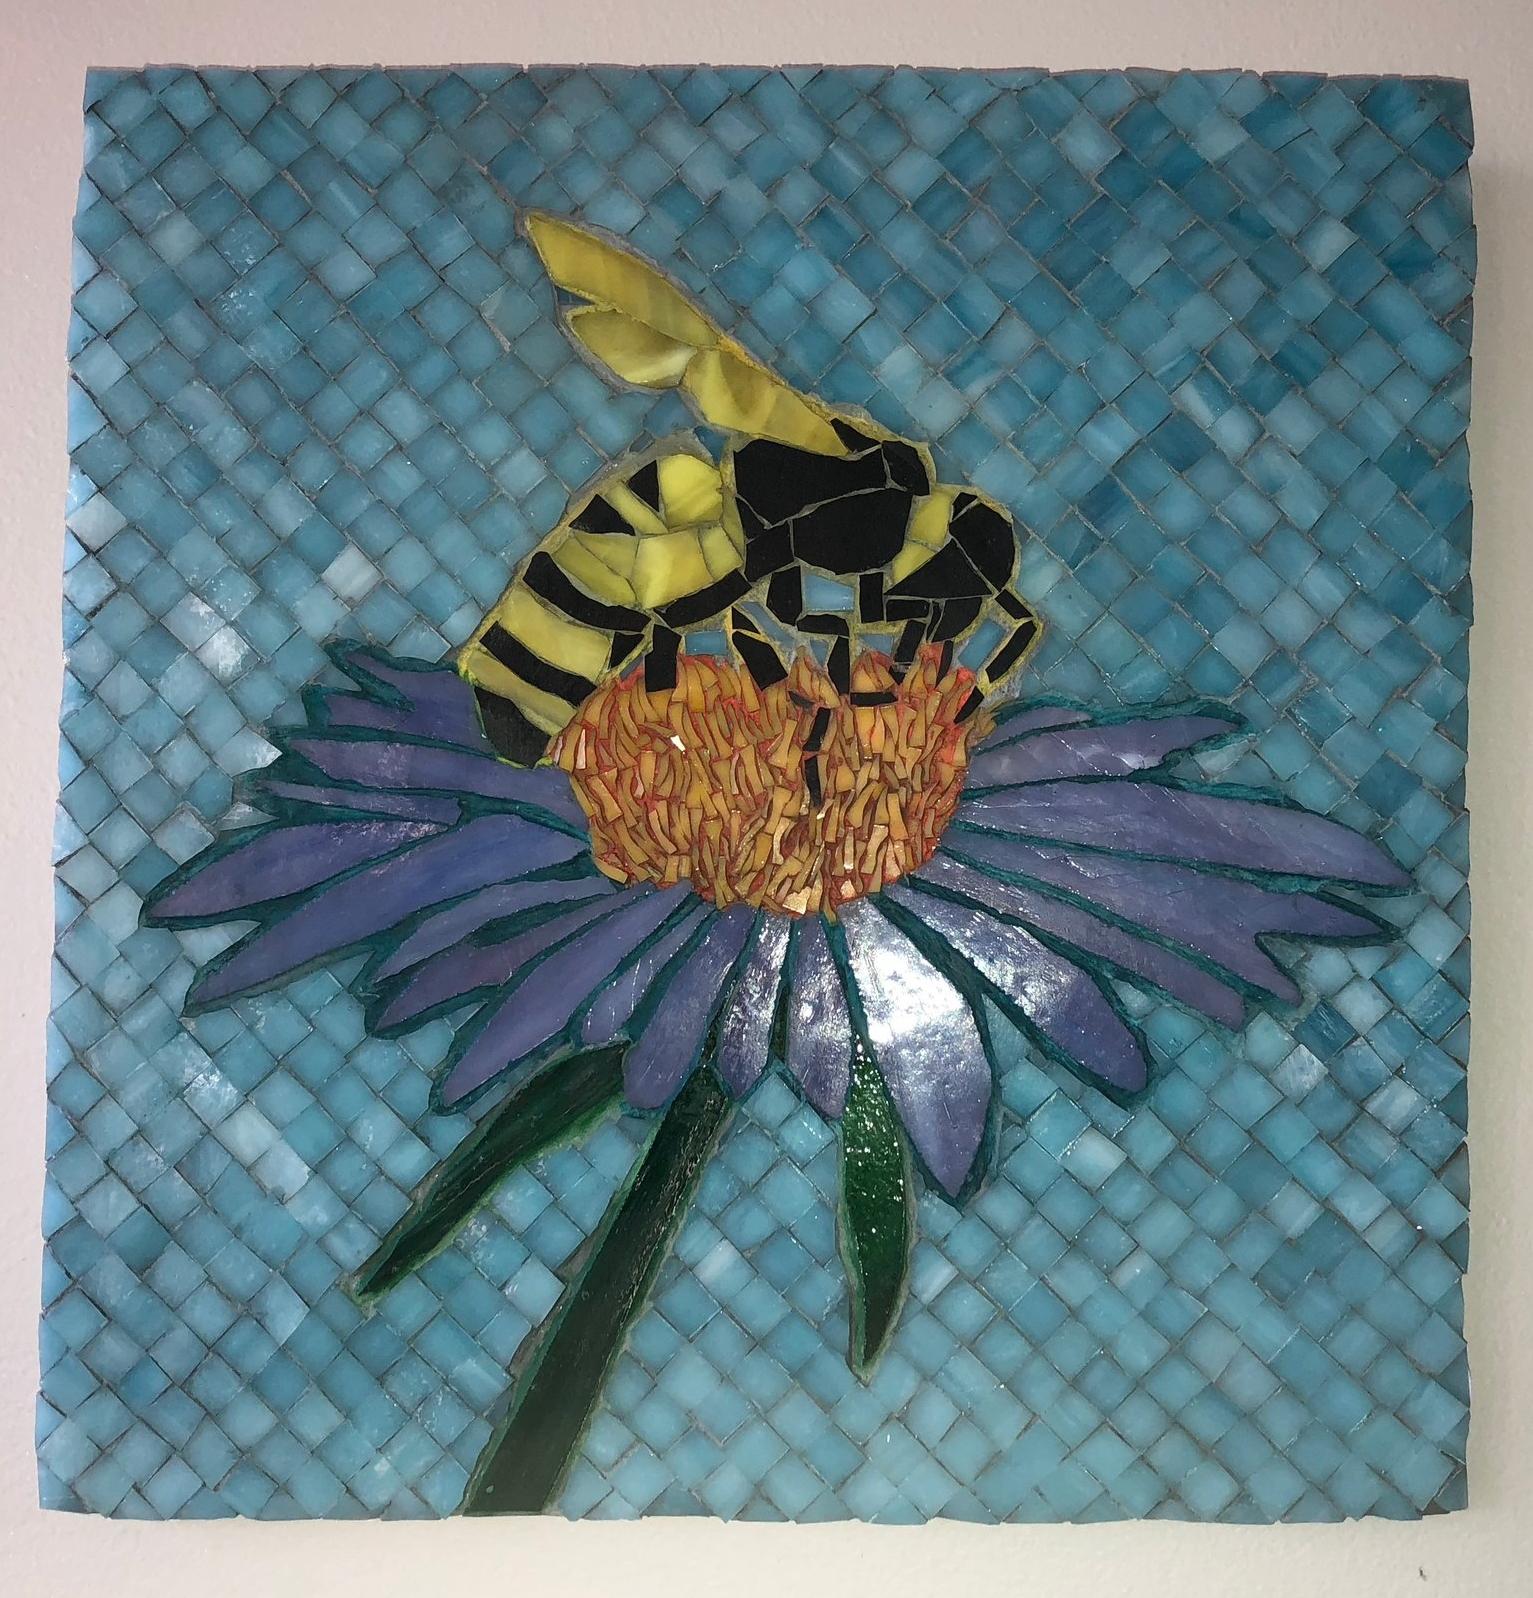 Mosaics by Linda Eshleman - Talented local Mosaic Artist from Cheriton!